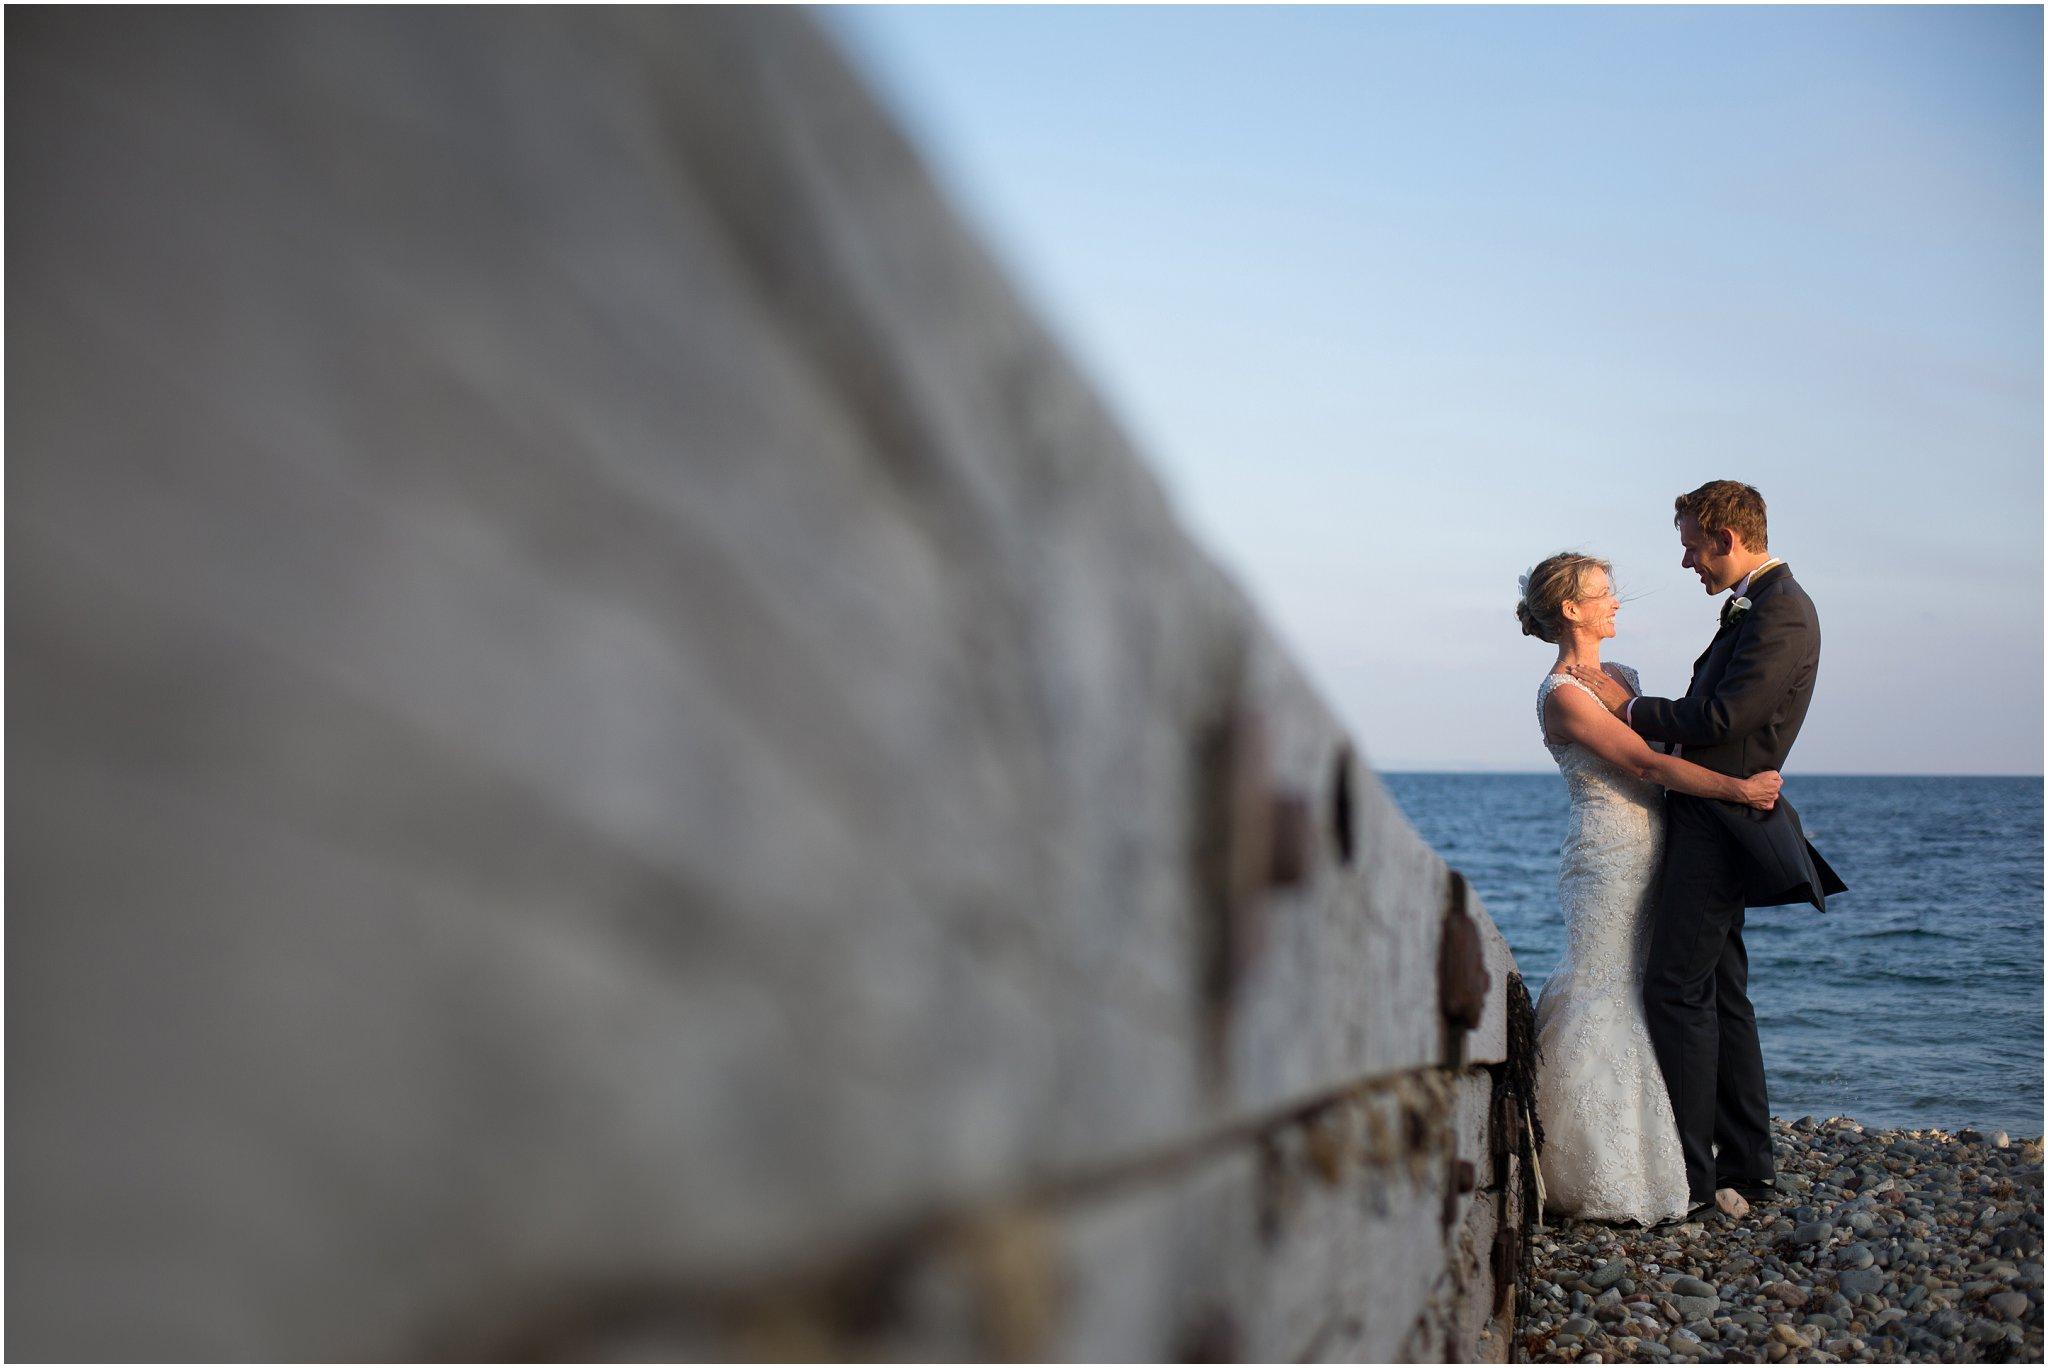 Wedding Beach Photography Bride and Groom